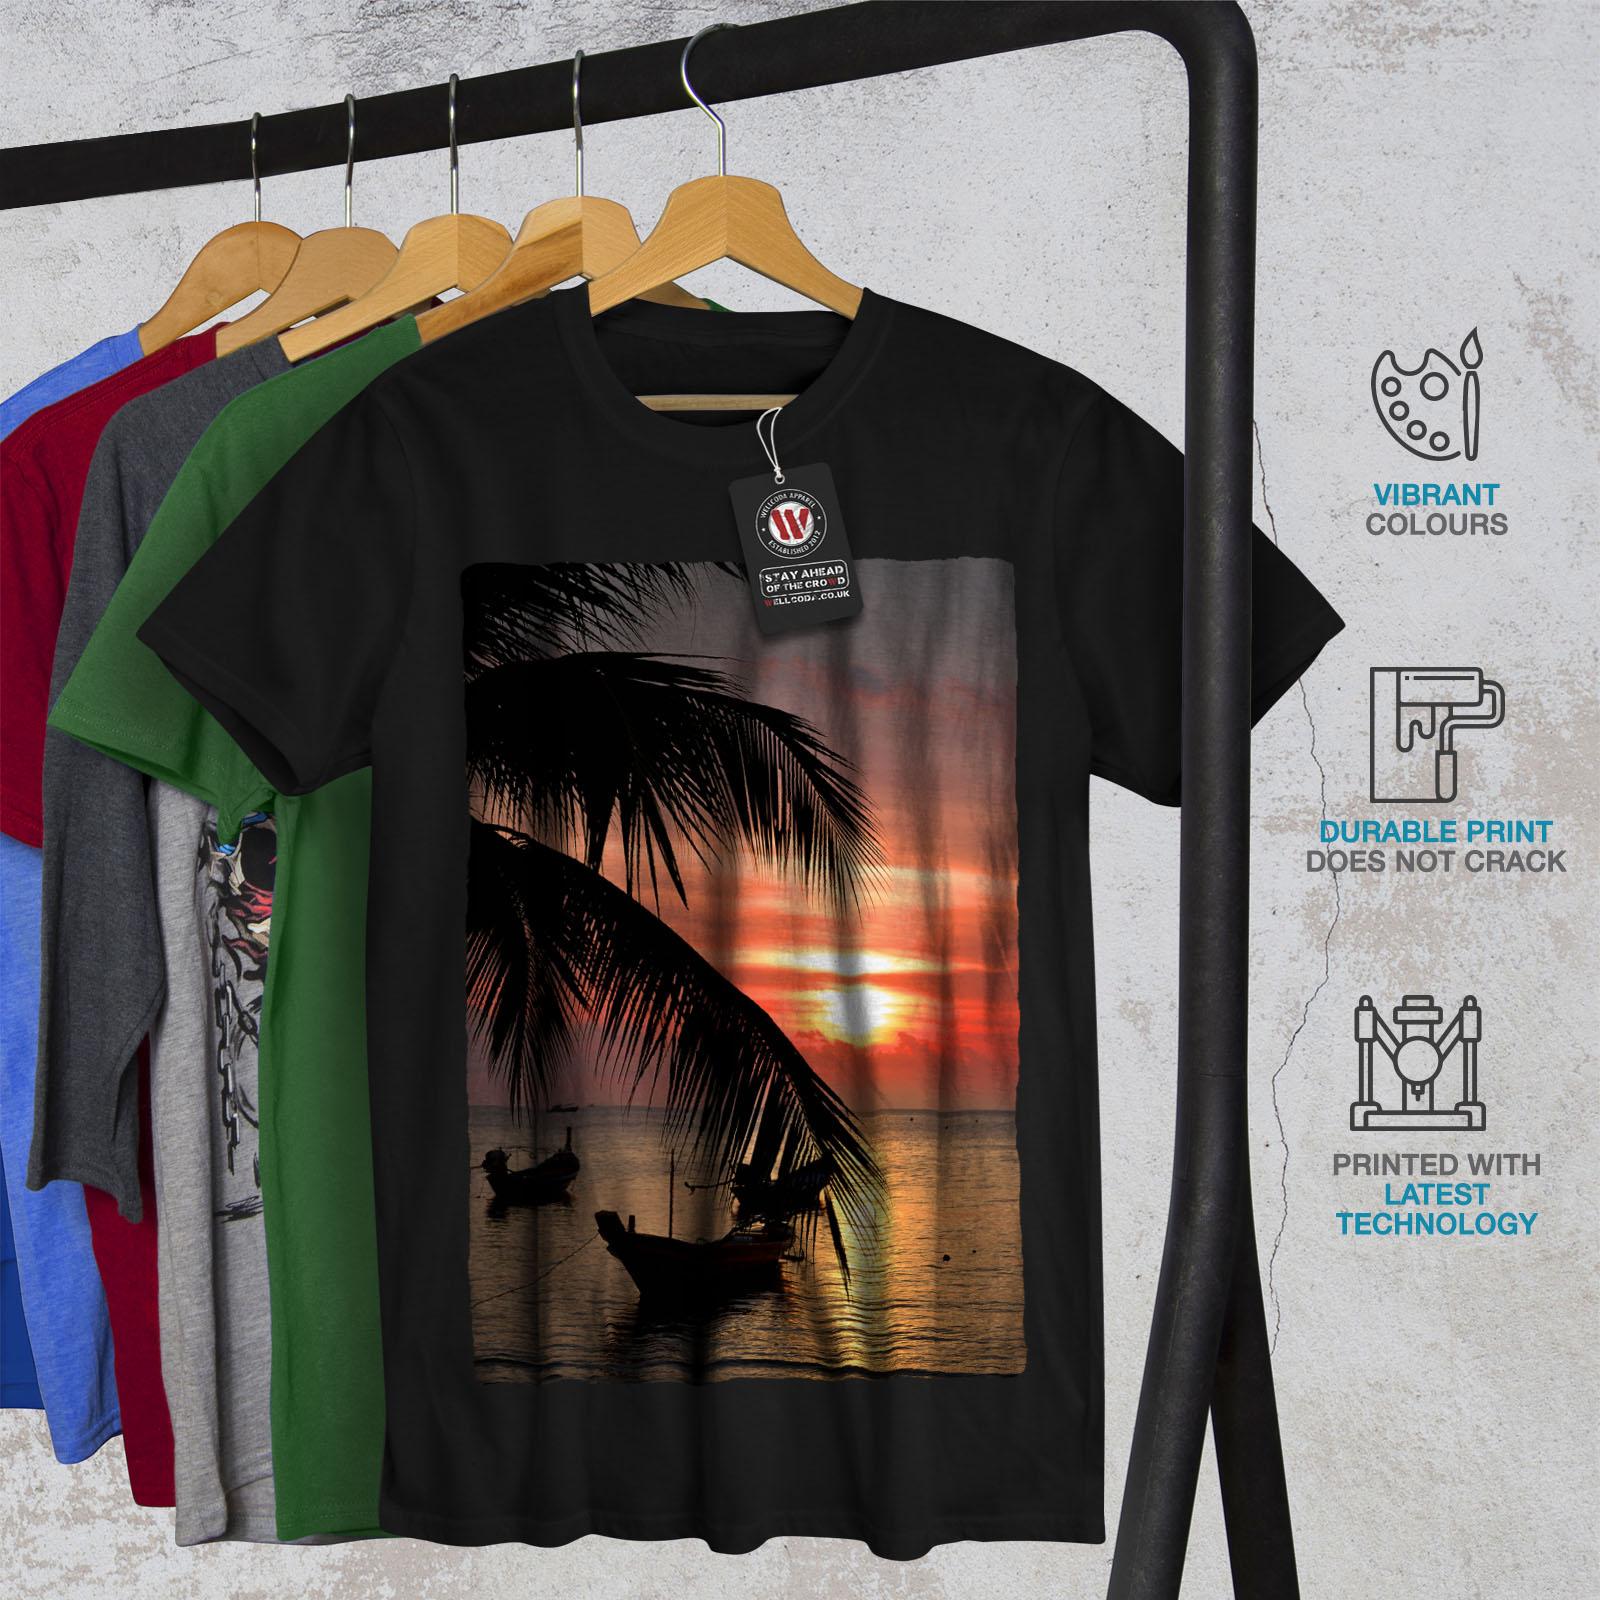 Wellcoda-Sunset-Palm-Tree-Mens-T-shirt-Ocean-Beach-Graphic-Design-Printed-Tee thumbnail 6